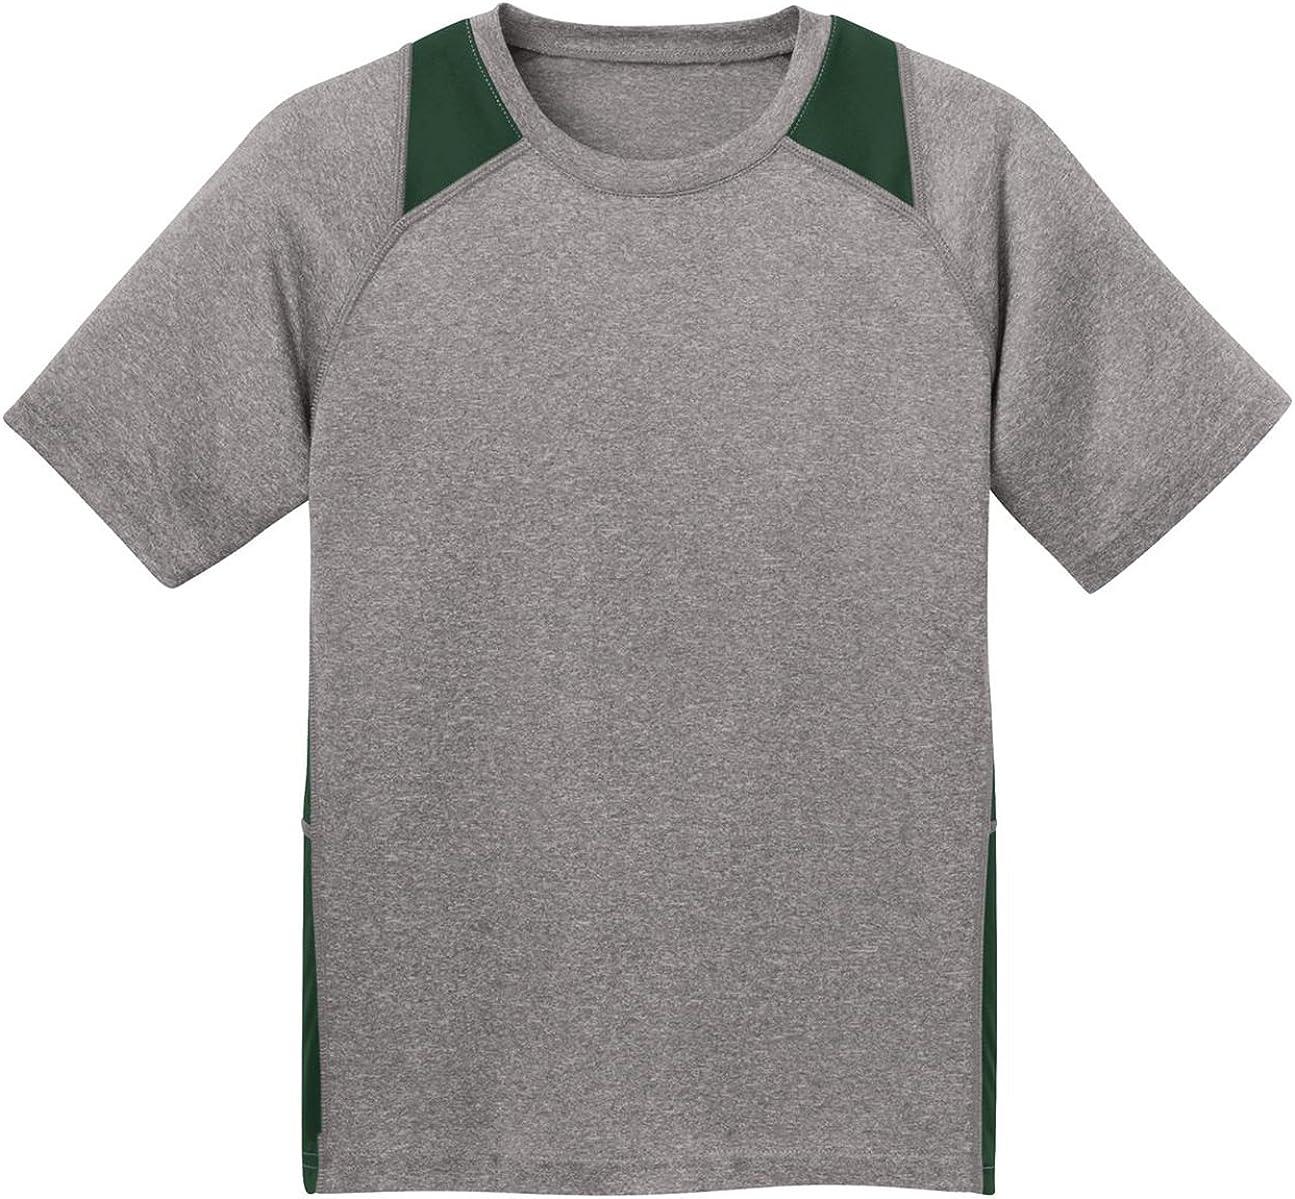 Sport-Tek YST81 Youth Fleece-Lined Colorblock - Ranking TOP6 Forest Gr Jacket Excellent